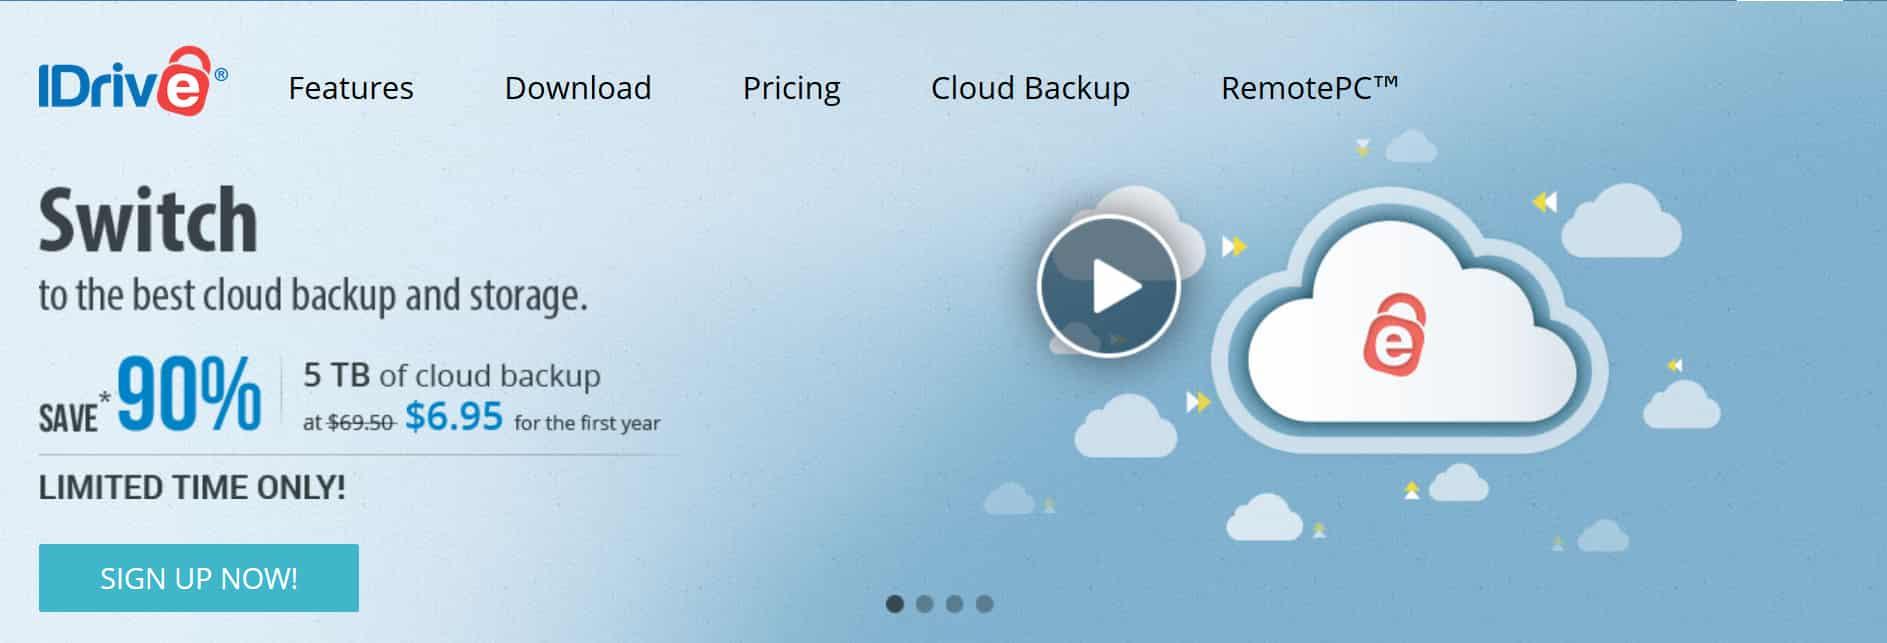 idrive online image backup service